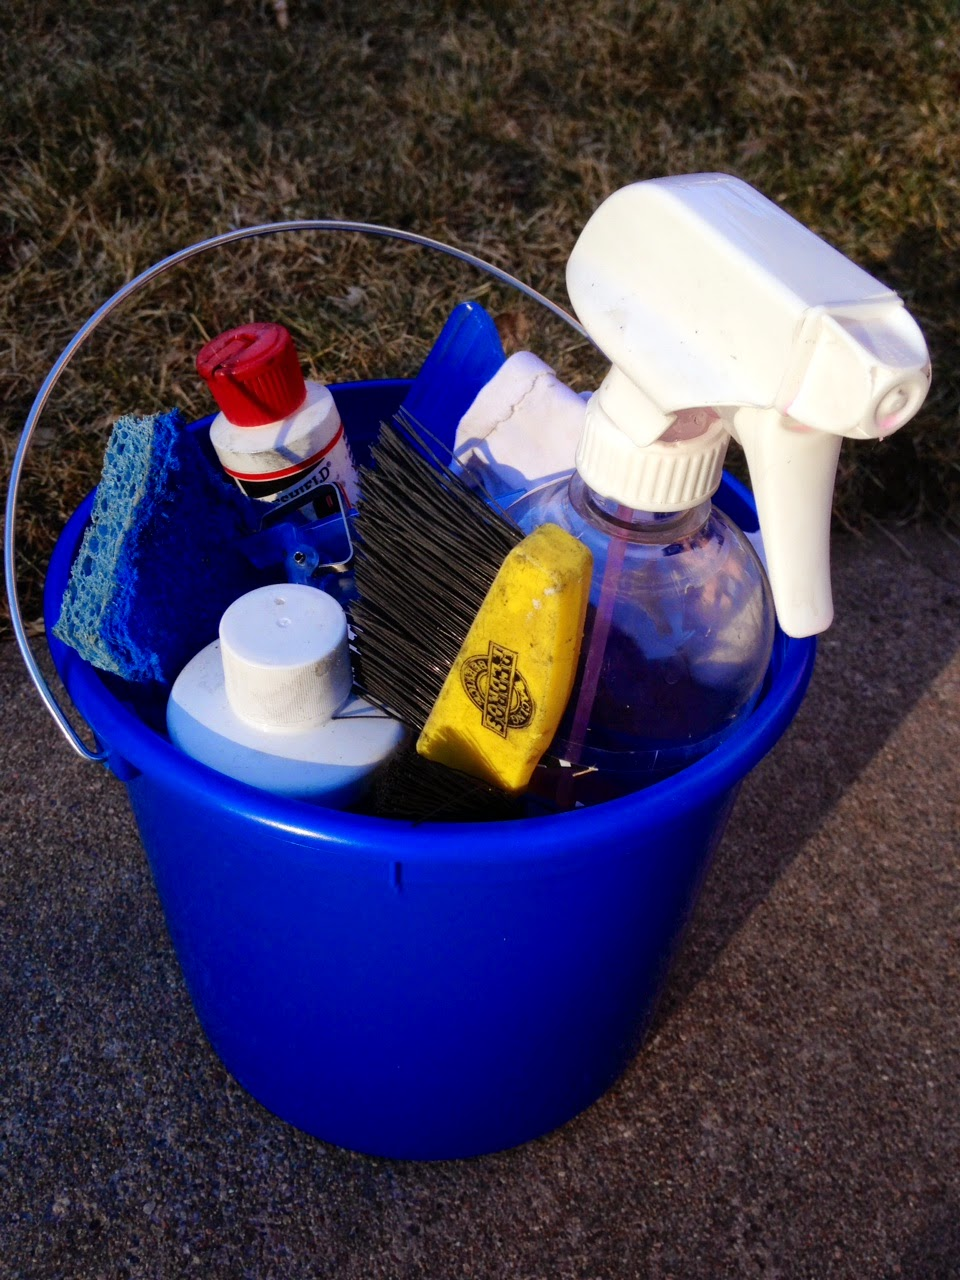 bucket of bike washing supplies